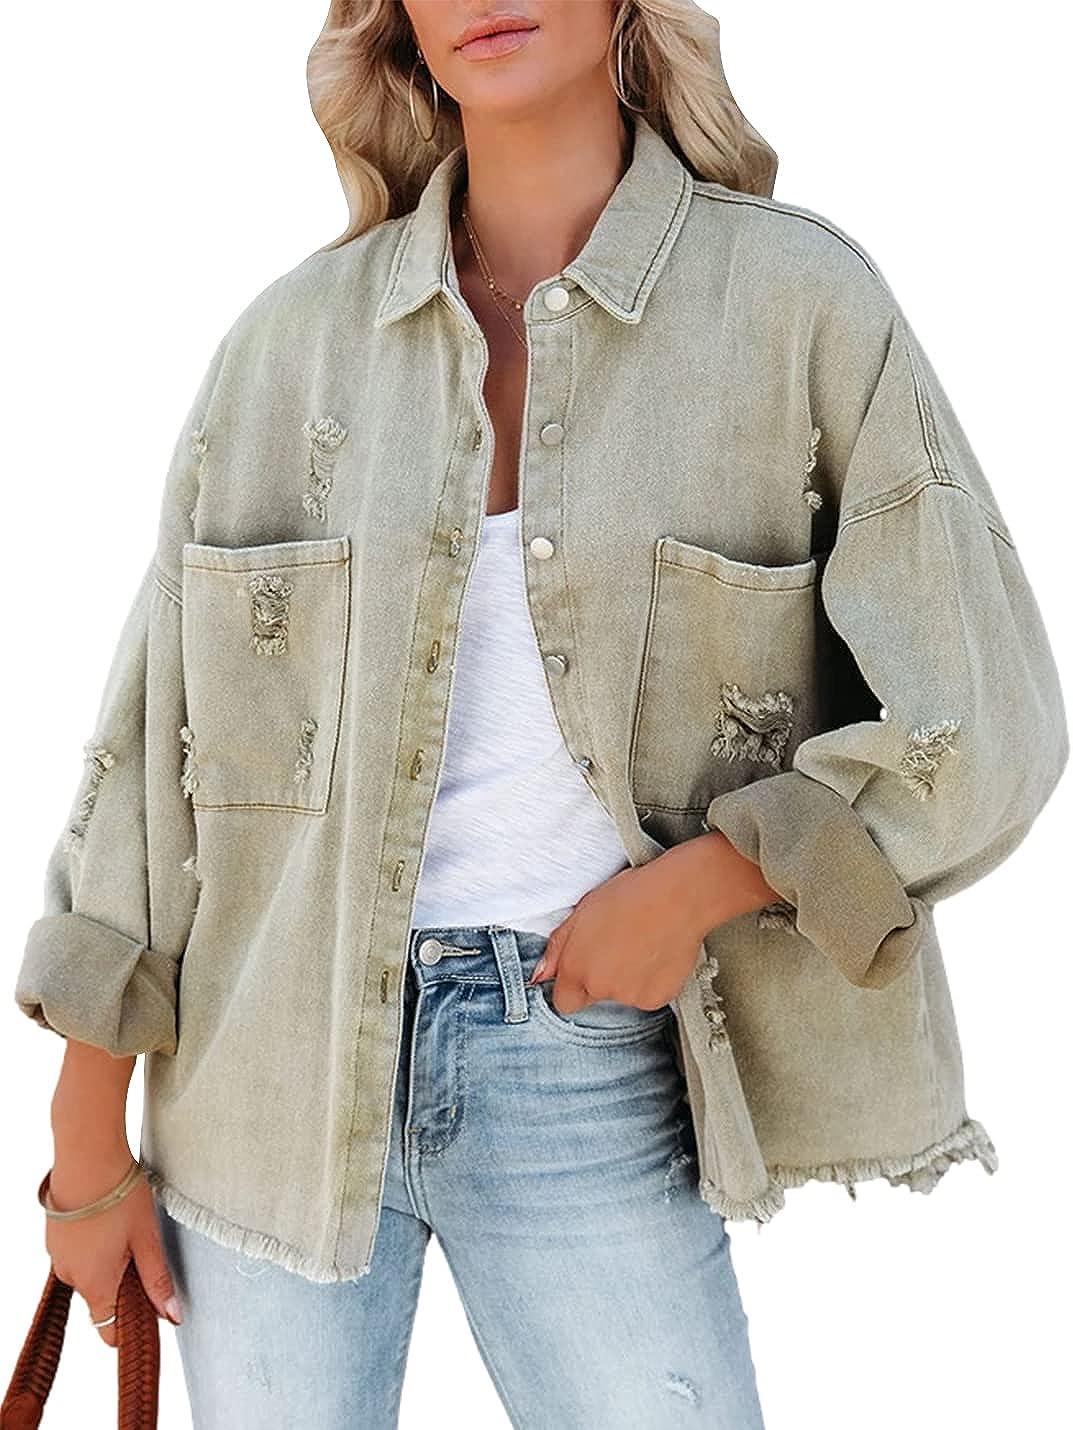 Xishiloft Women's Frayed Denim Jackets Lapel Long Sleeve Buttons Washed Distressed Holes Casual Oversized Coats